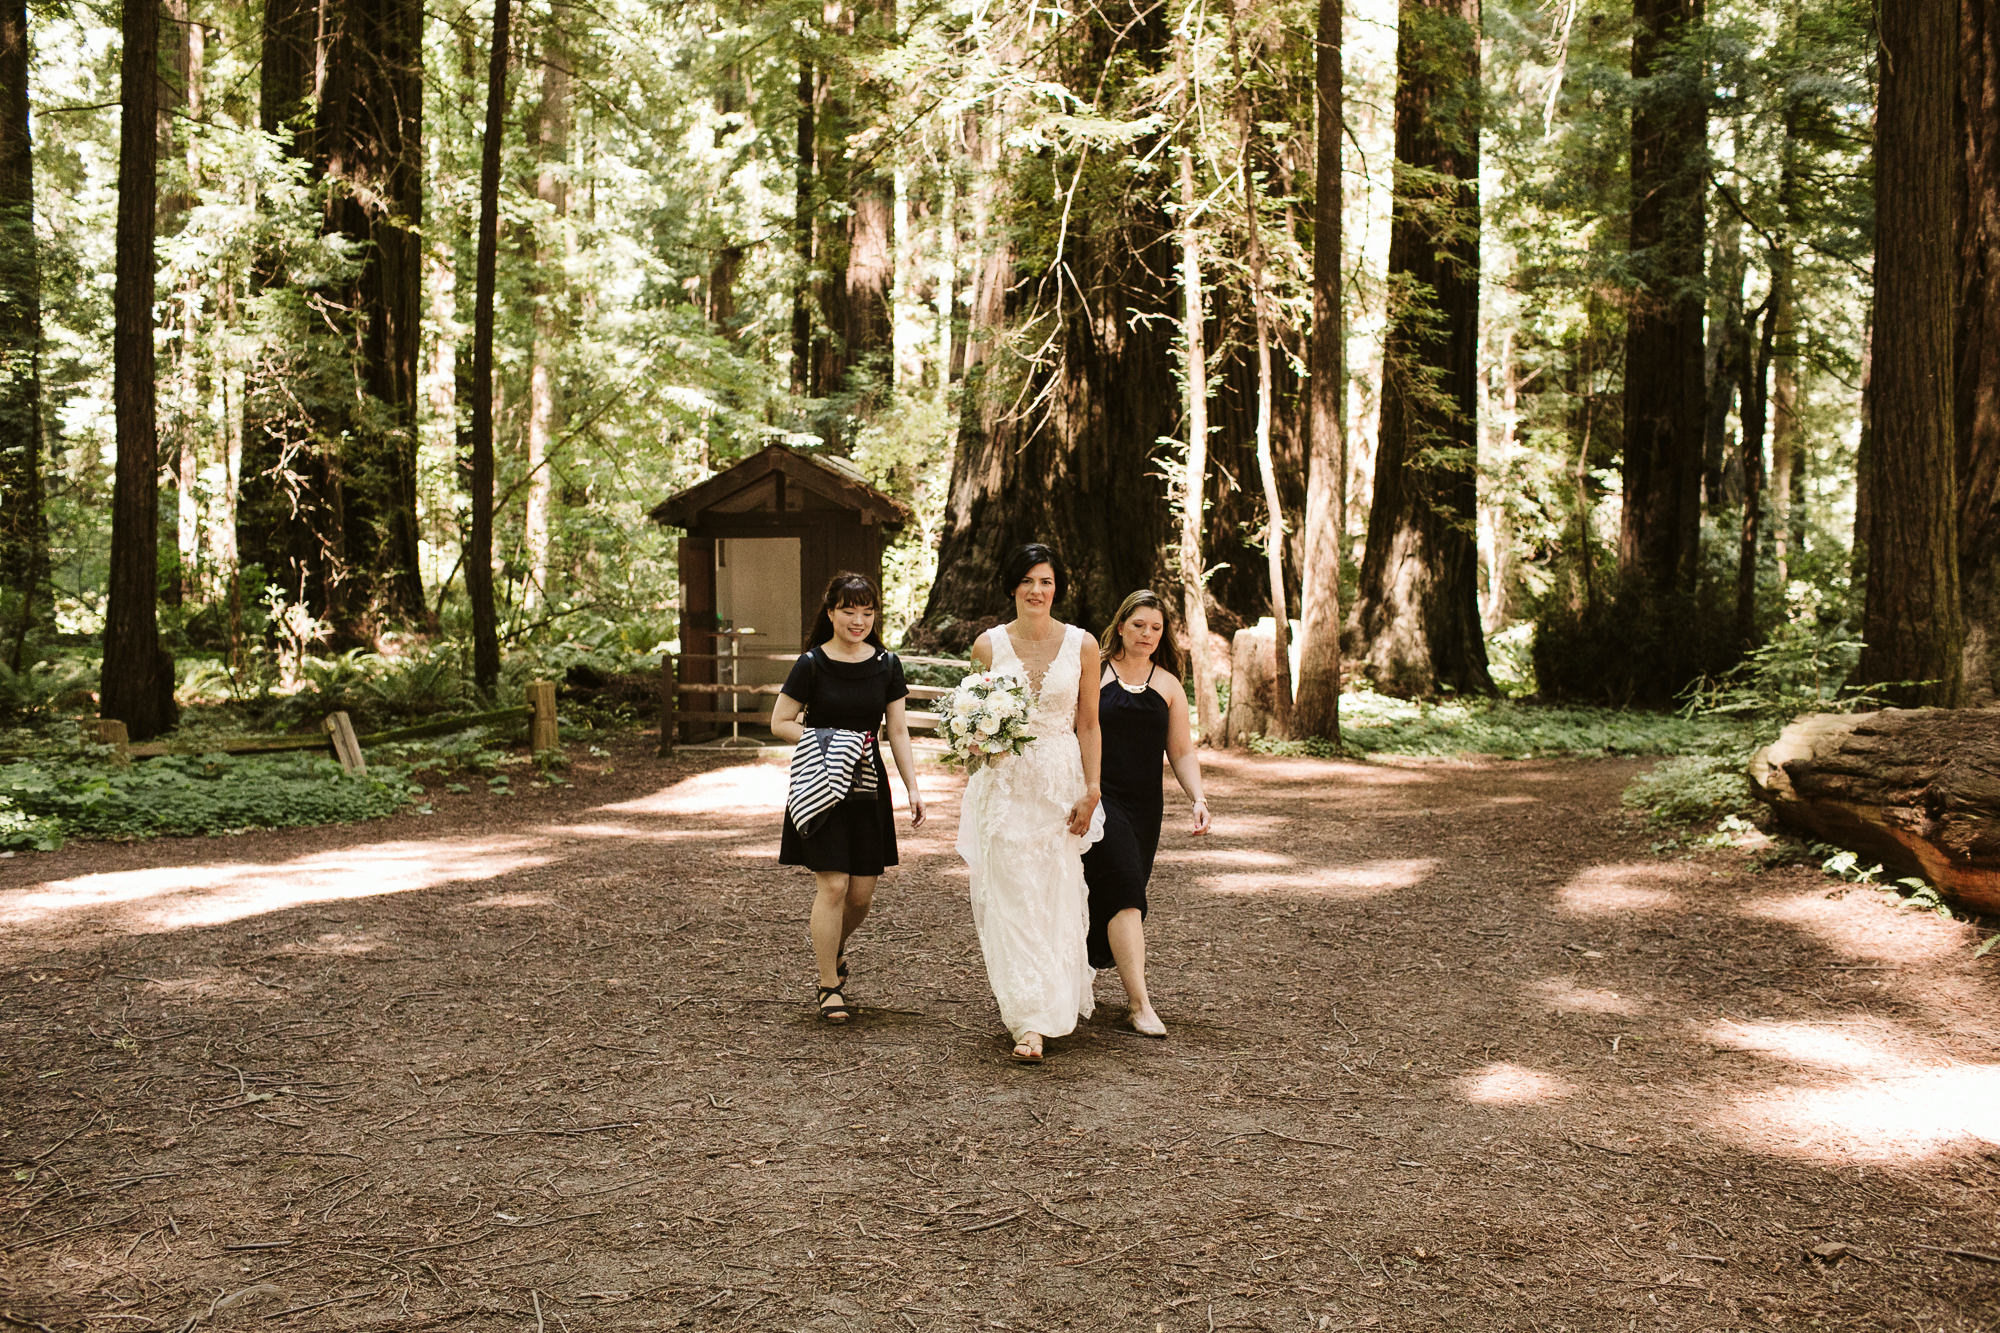 California-wedding-photographer-alfonso-flores-pamplin-groove-154.jpg